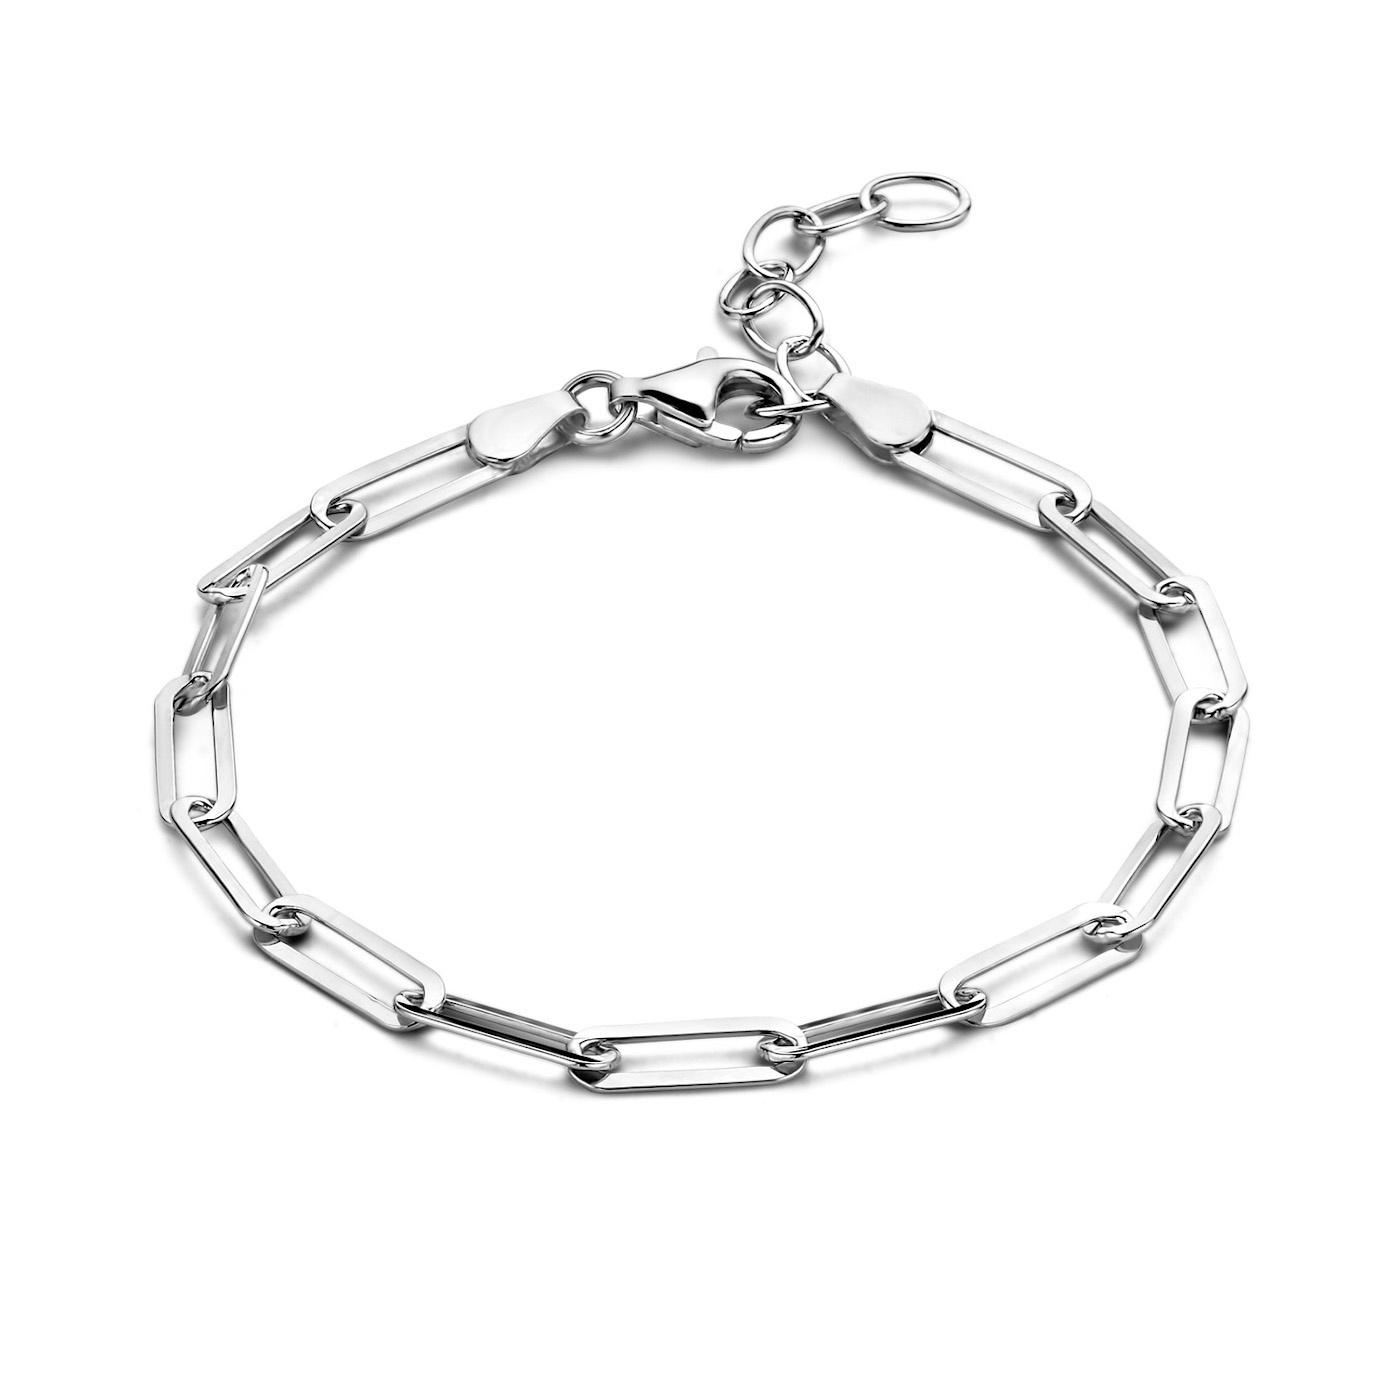 Selected Jewels Emma Jolie armband i 925 sterling silver